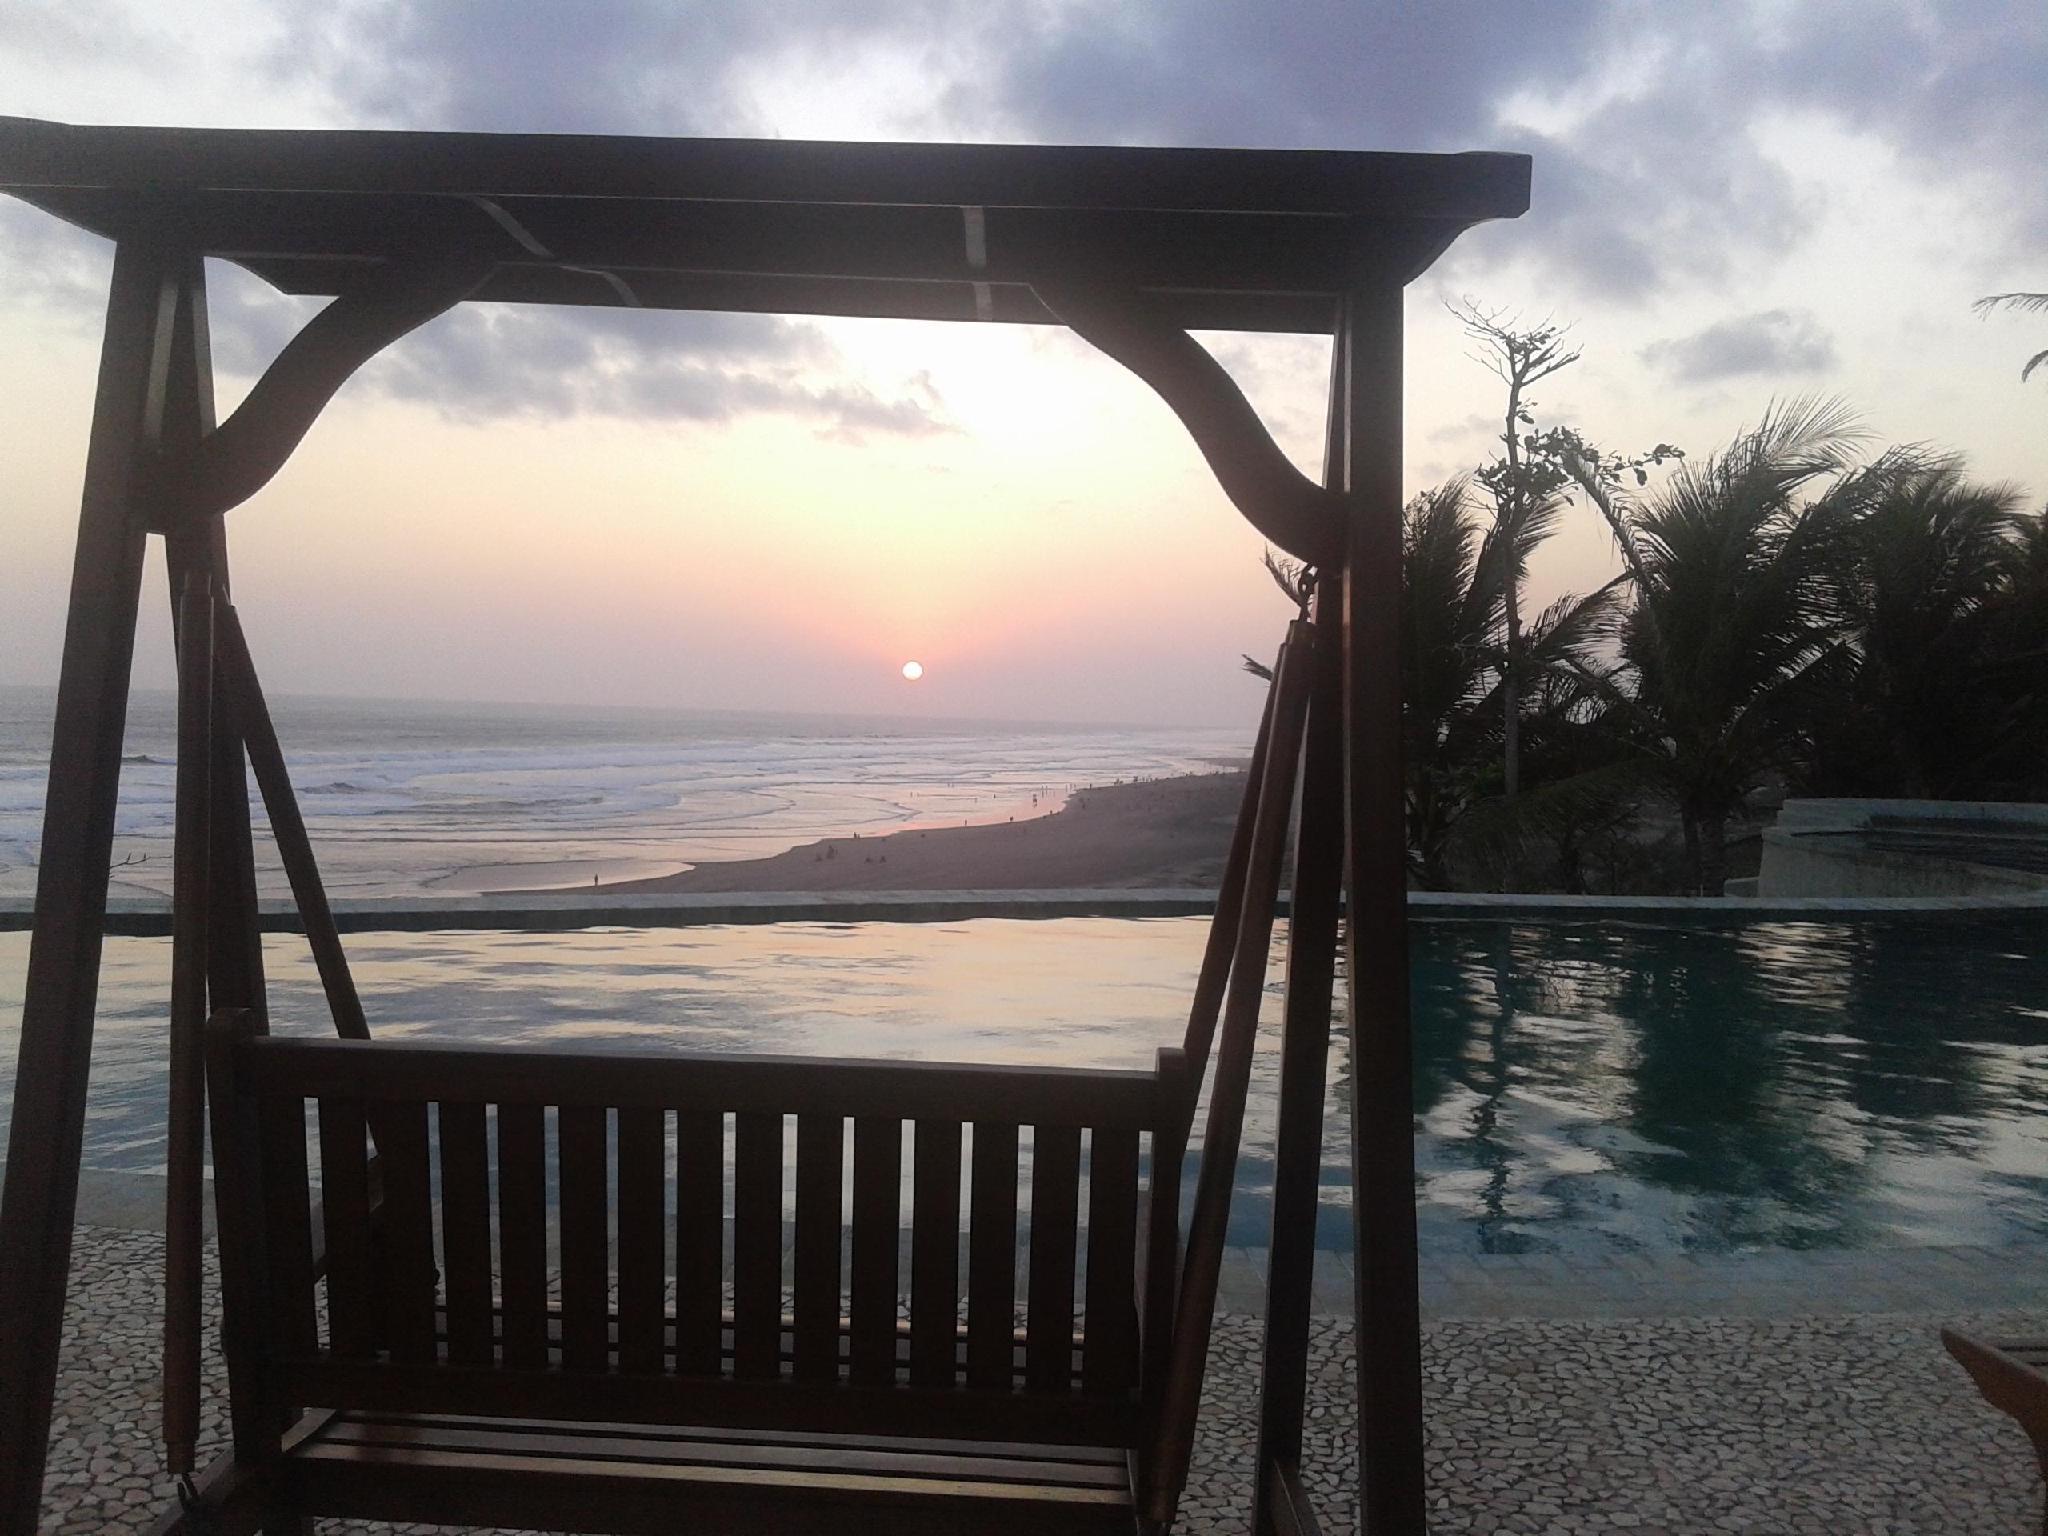 Queen Resort Hotel Romantis Di Pantai Parangtritis